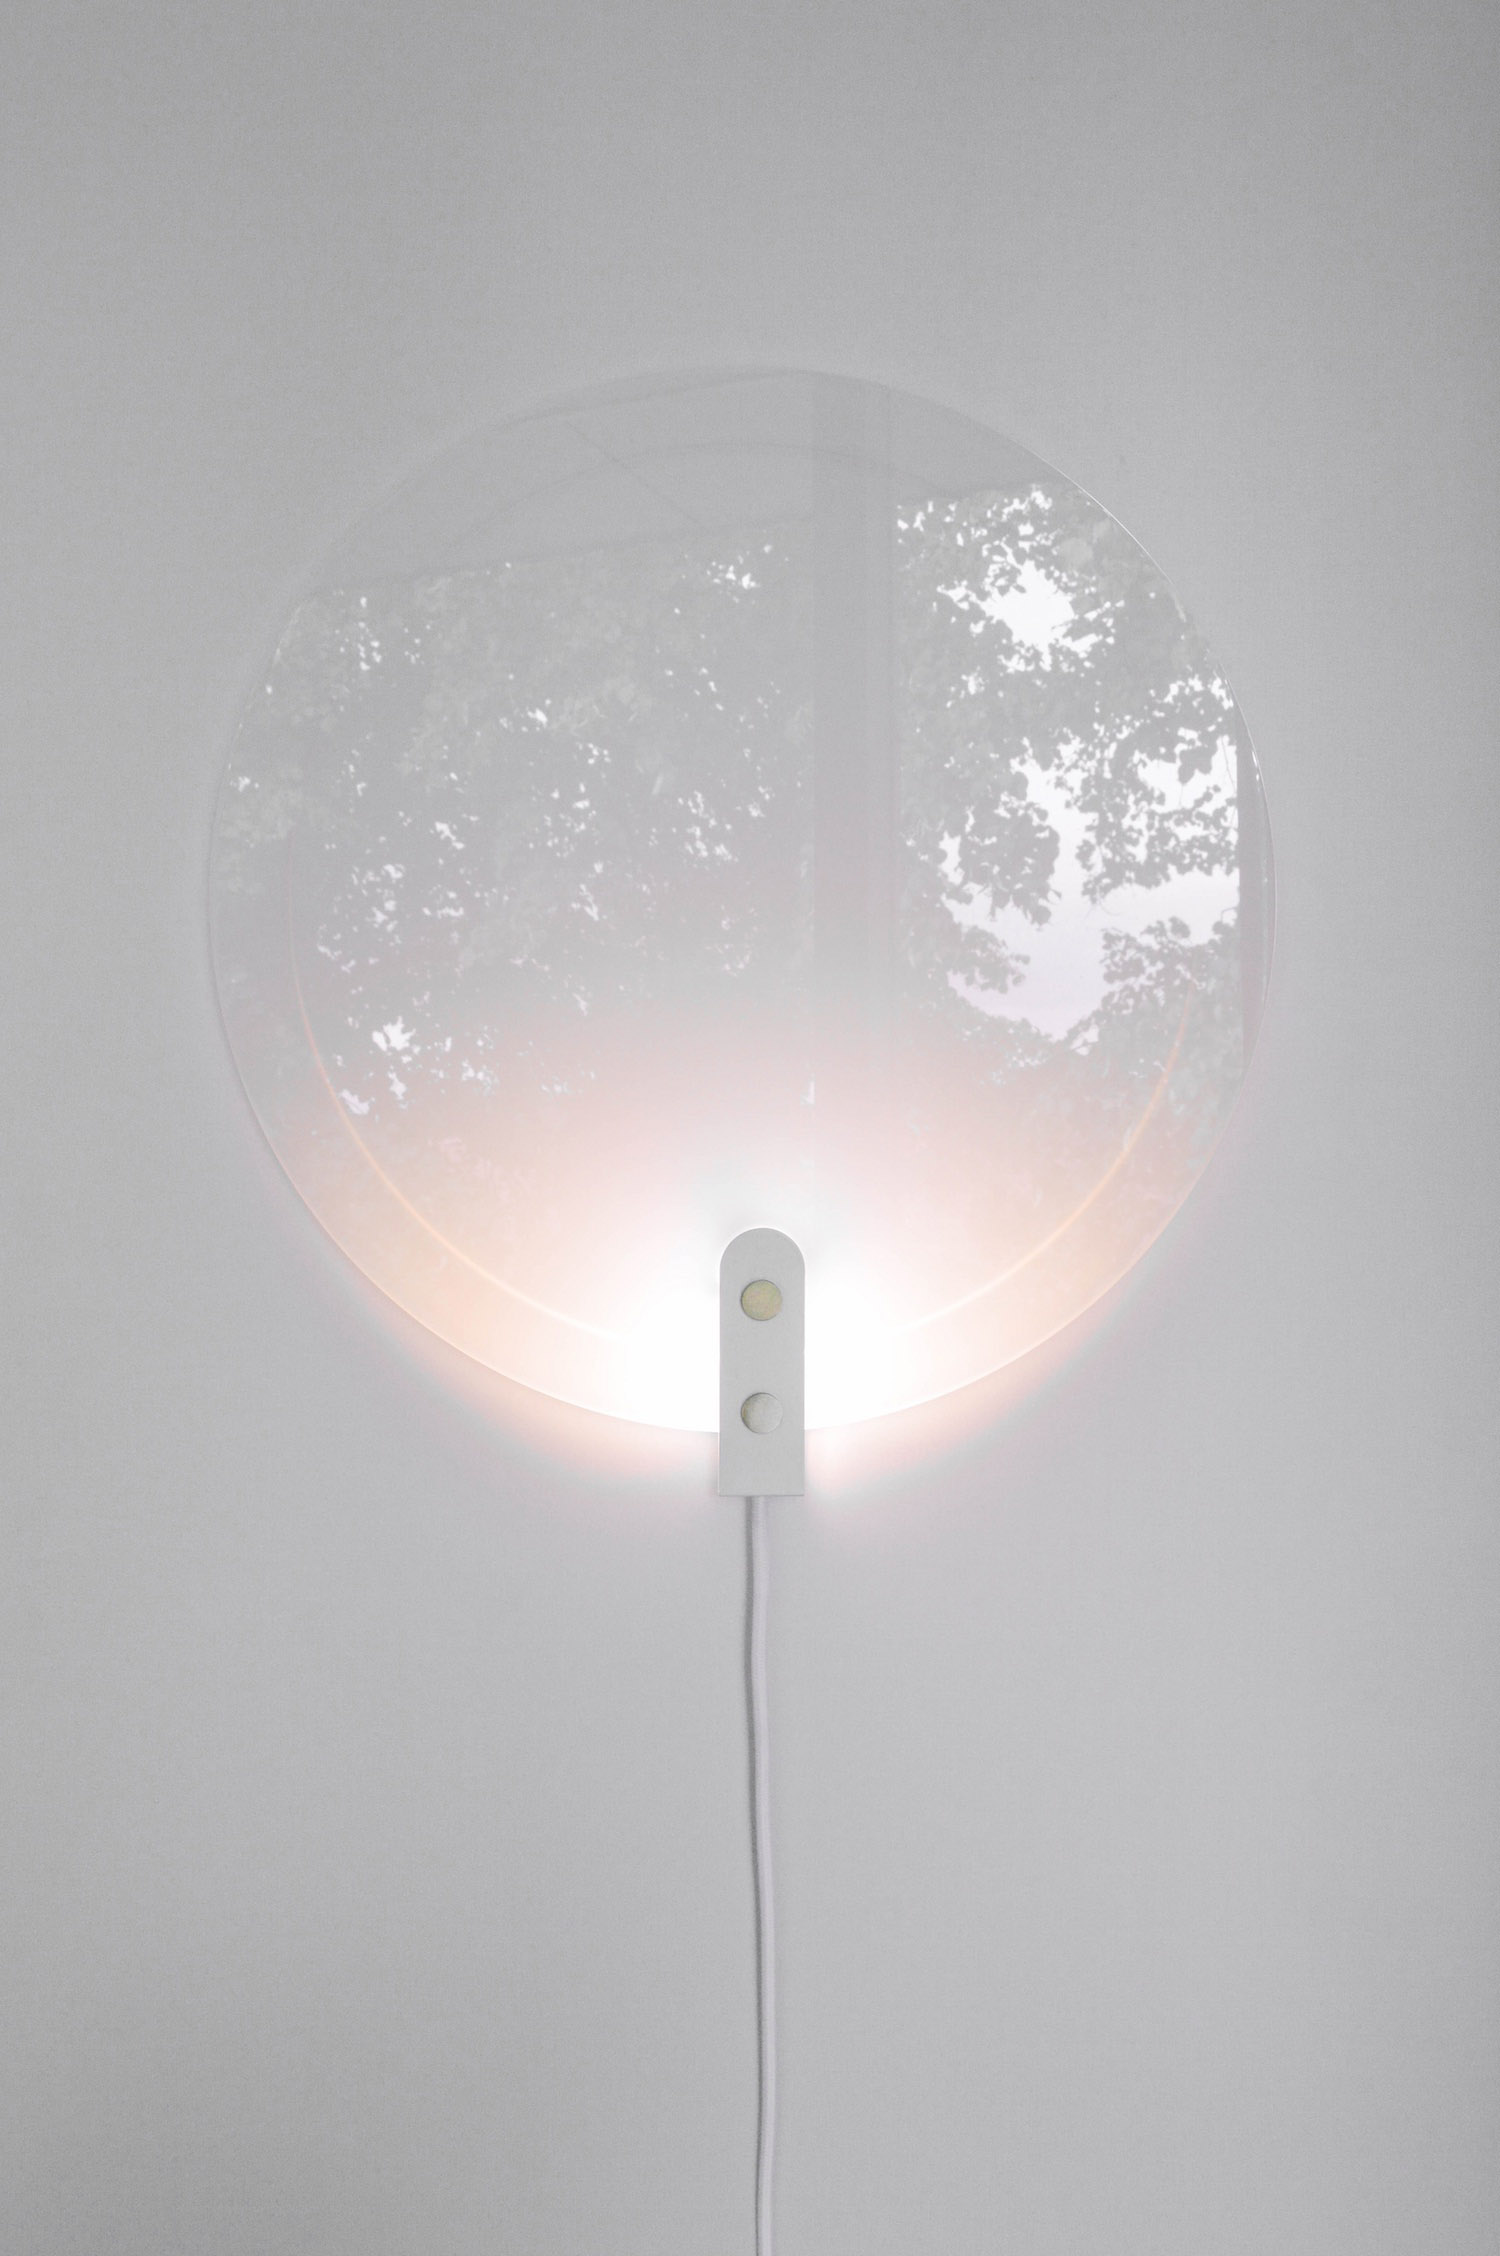 design_studio_fabian_zeijler-designs_lamps_sun_gazing_07